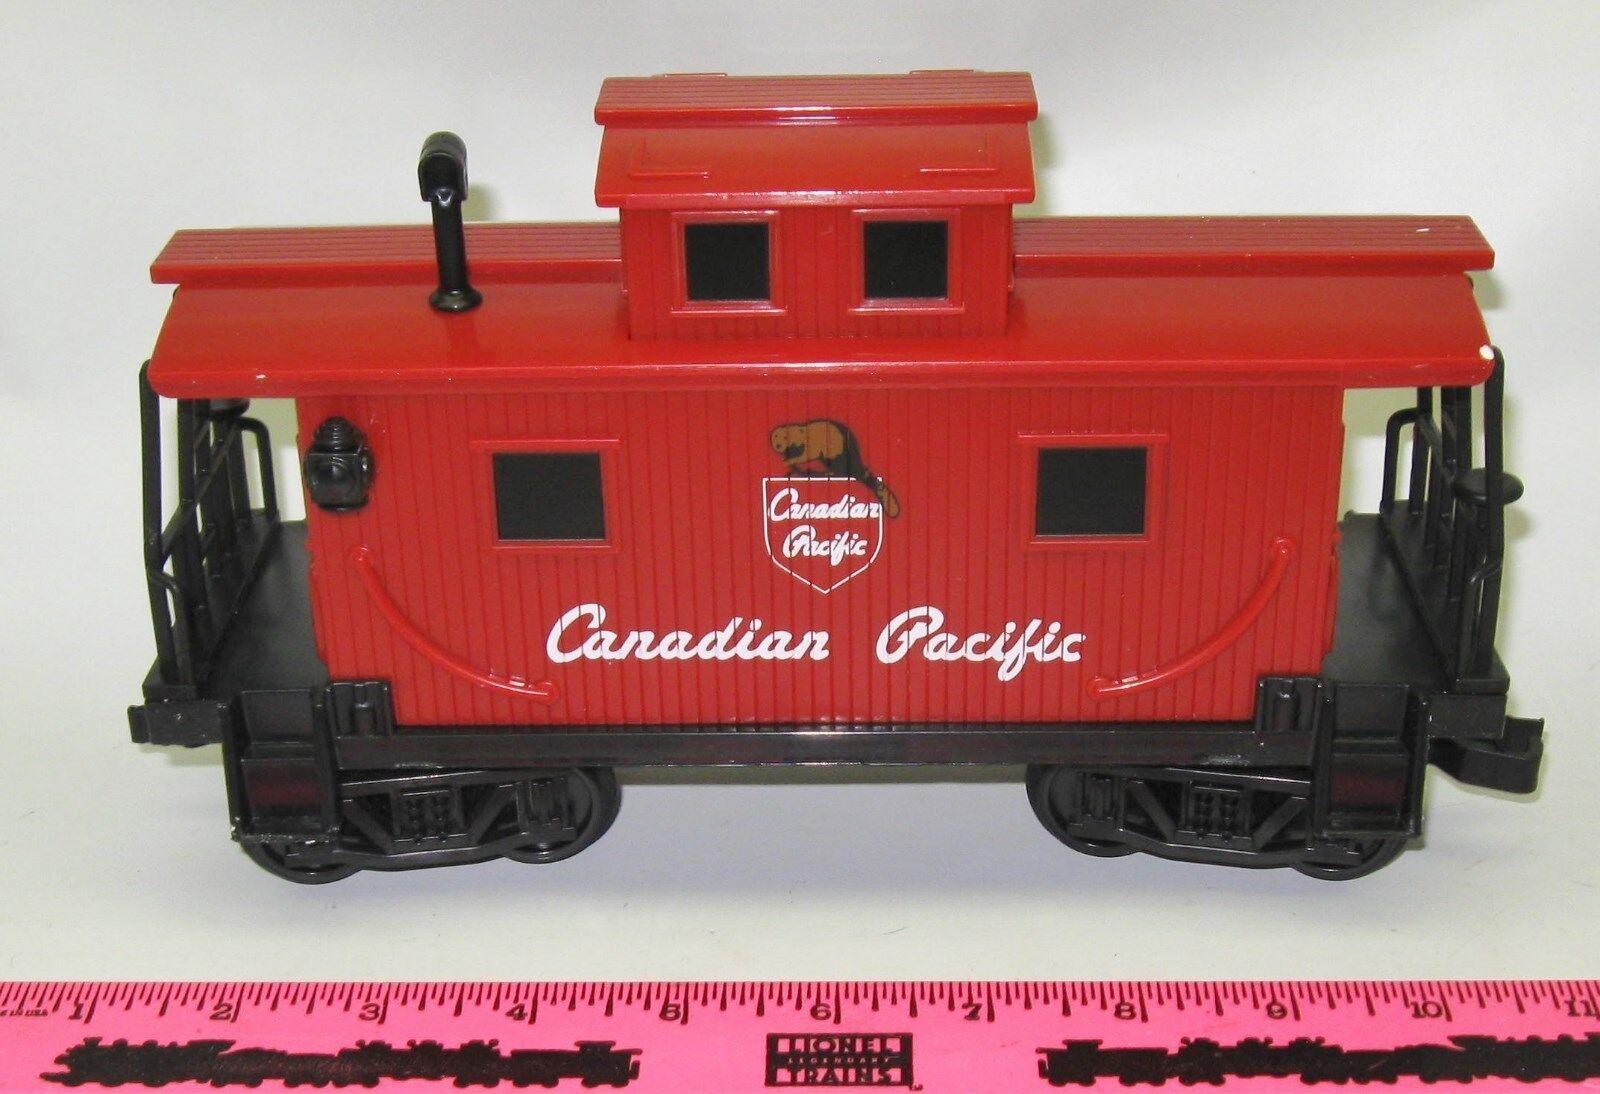 Lionel new new new 711401 Canadian Pacific G-Gauge caboose e82dea